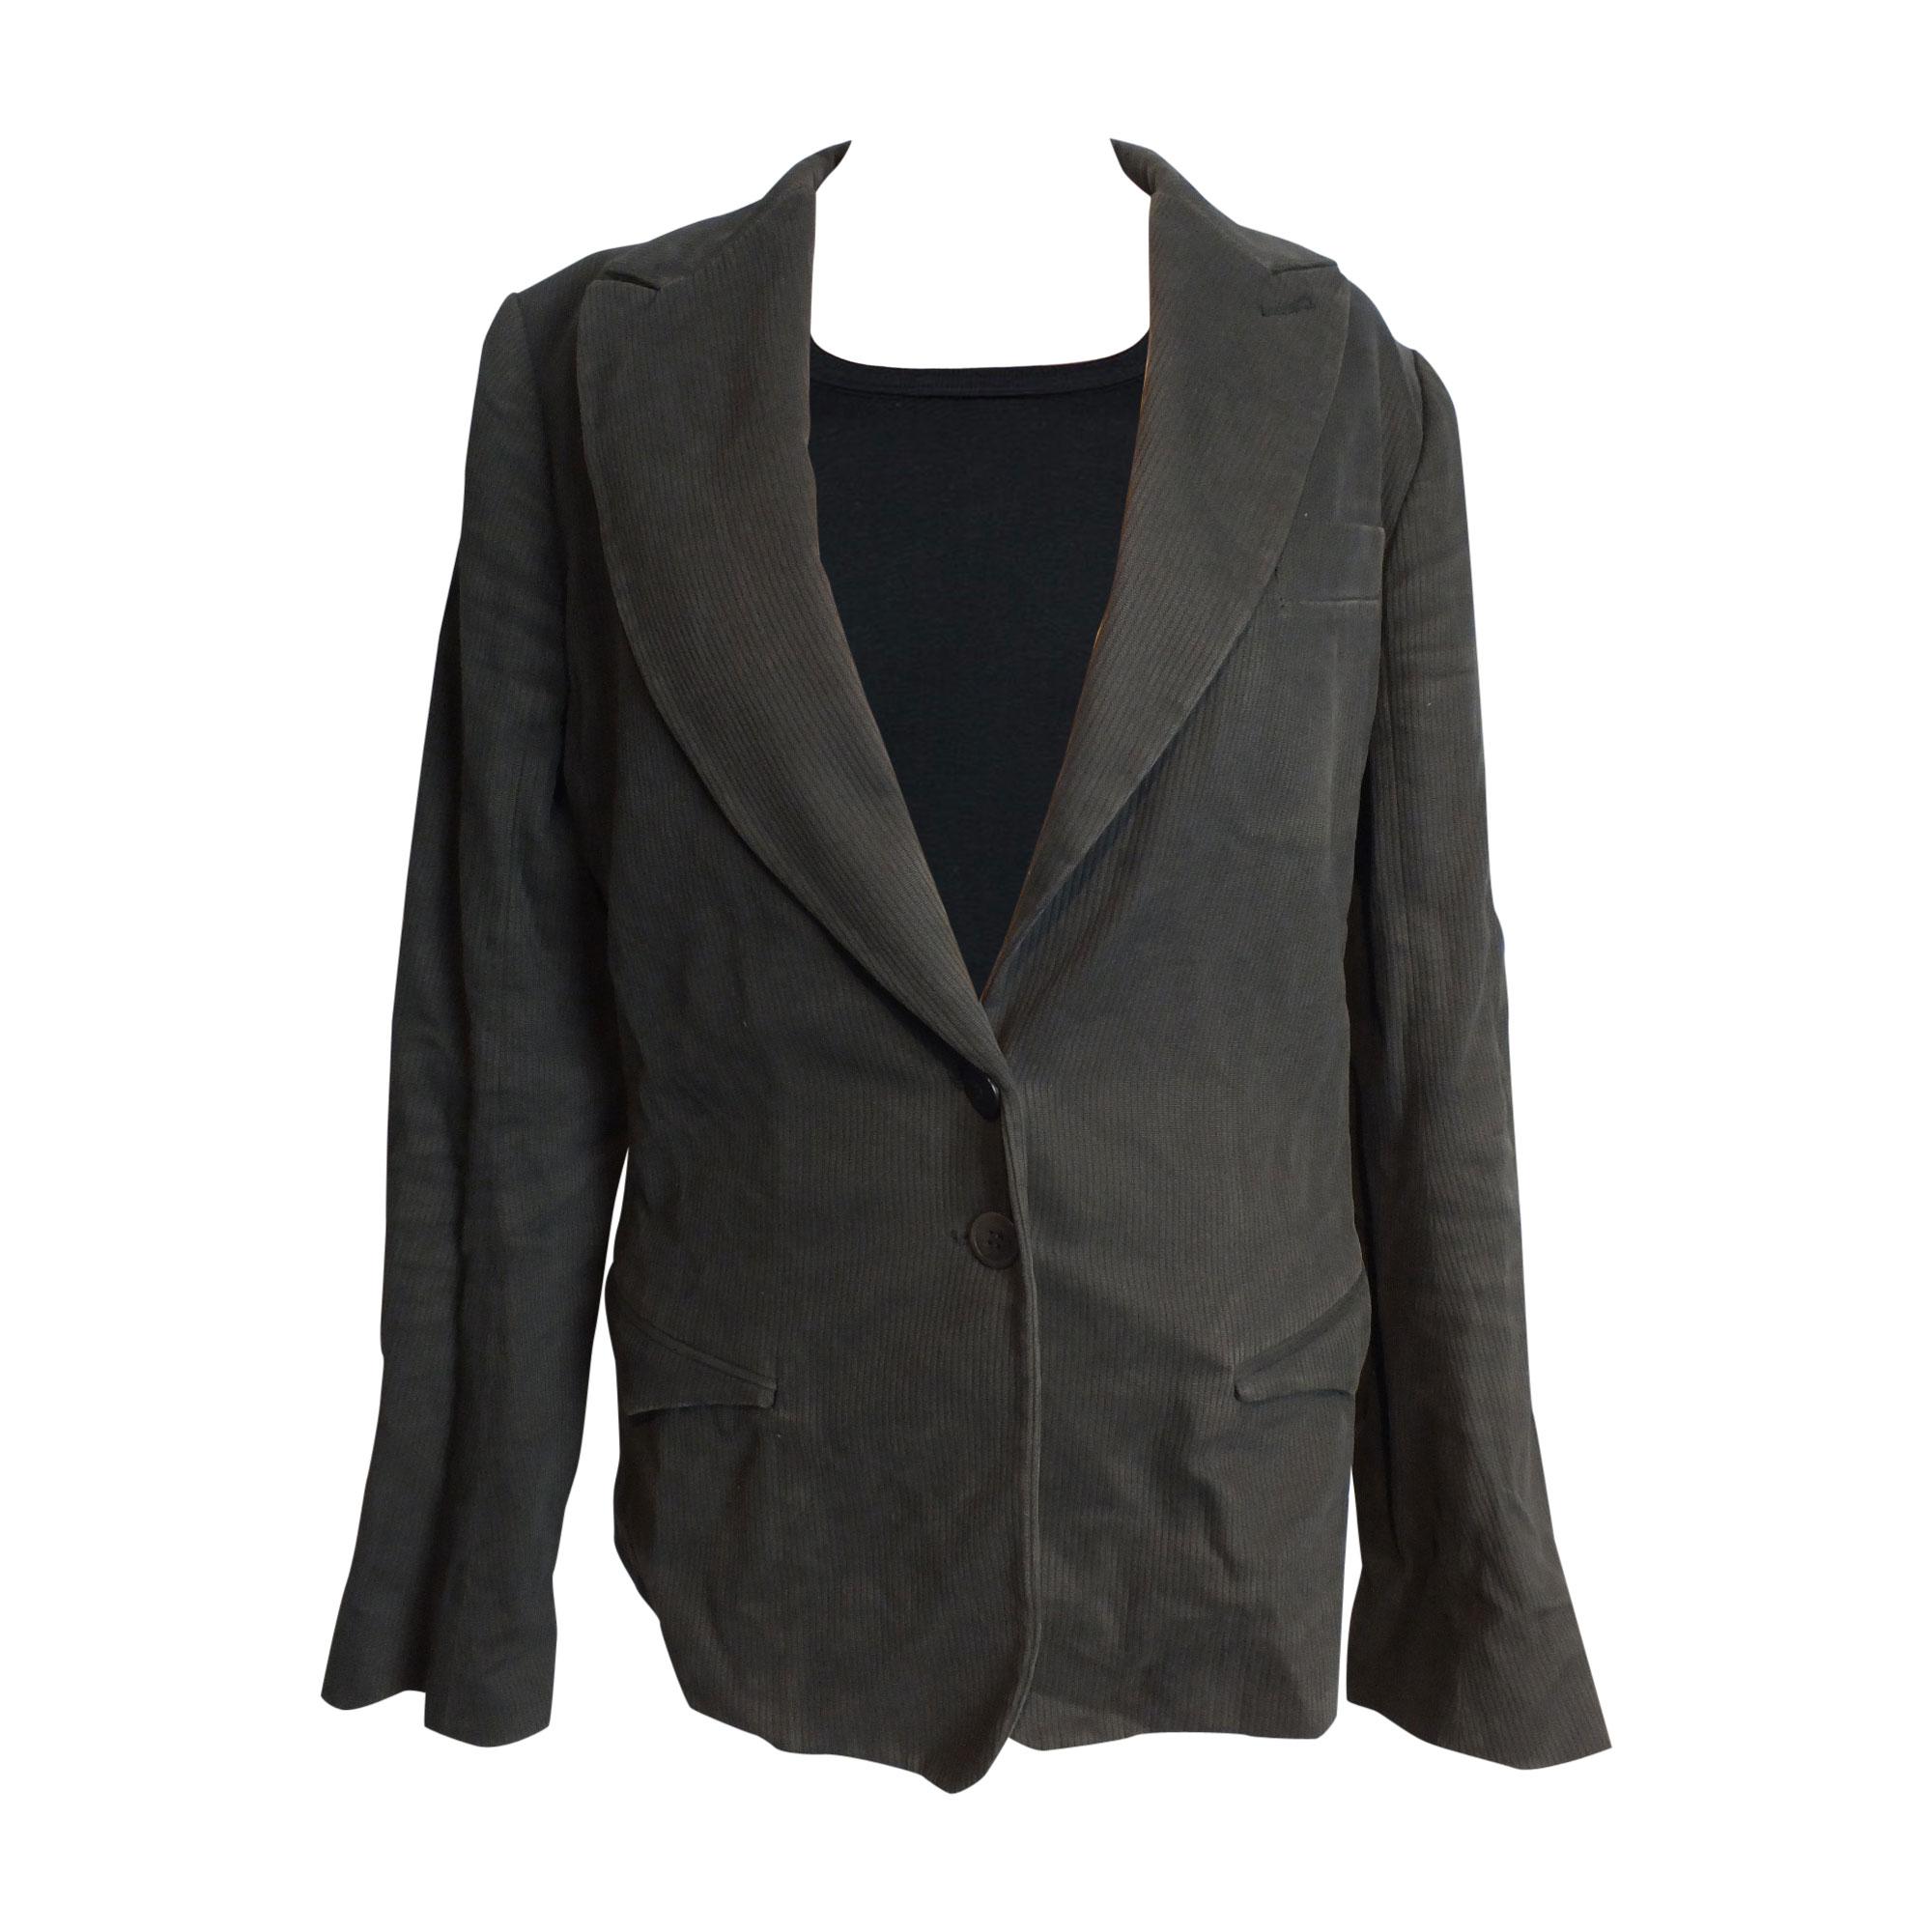 Blazer, veste tailleur ISABEL MARANT ETOILE Gris, anthracite